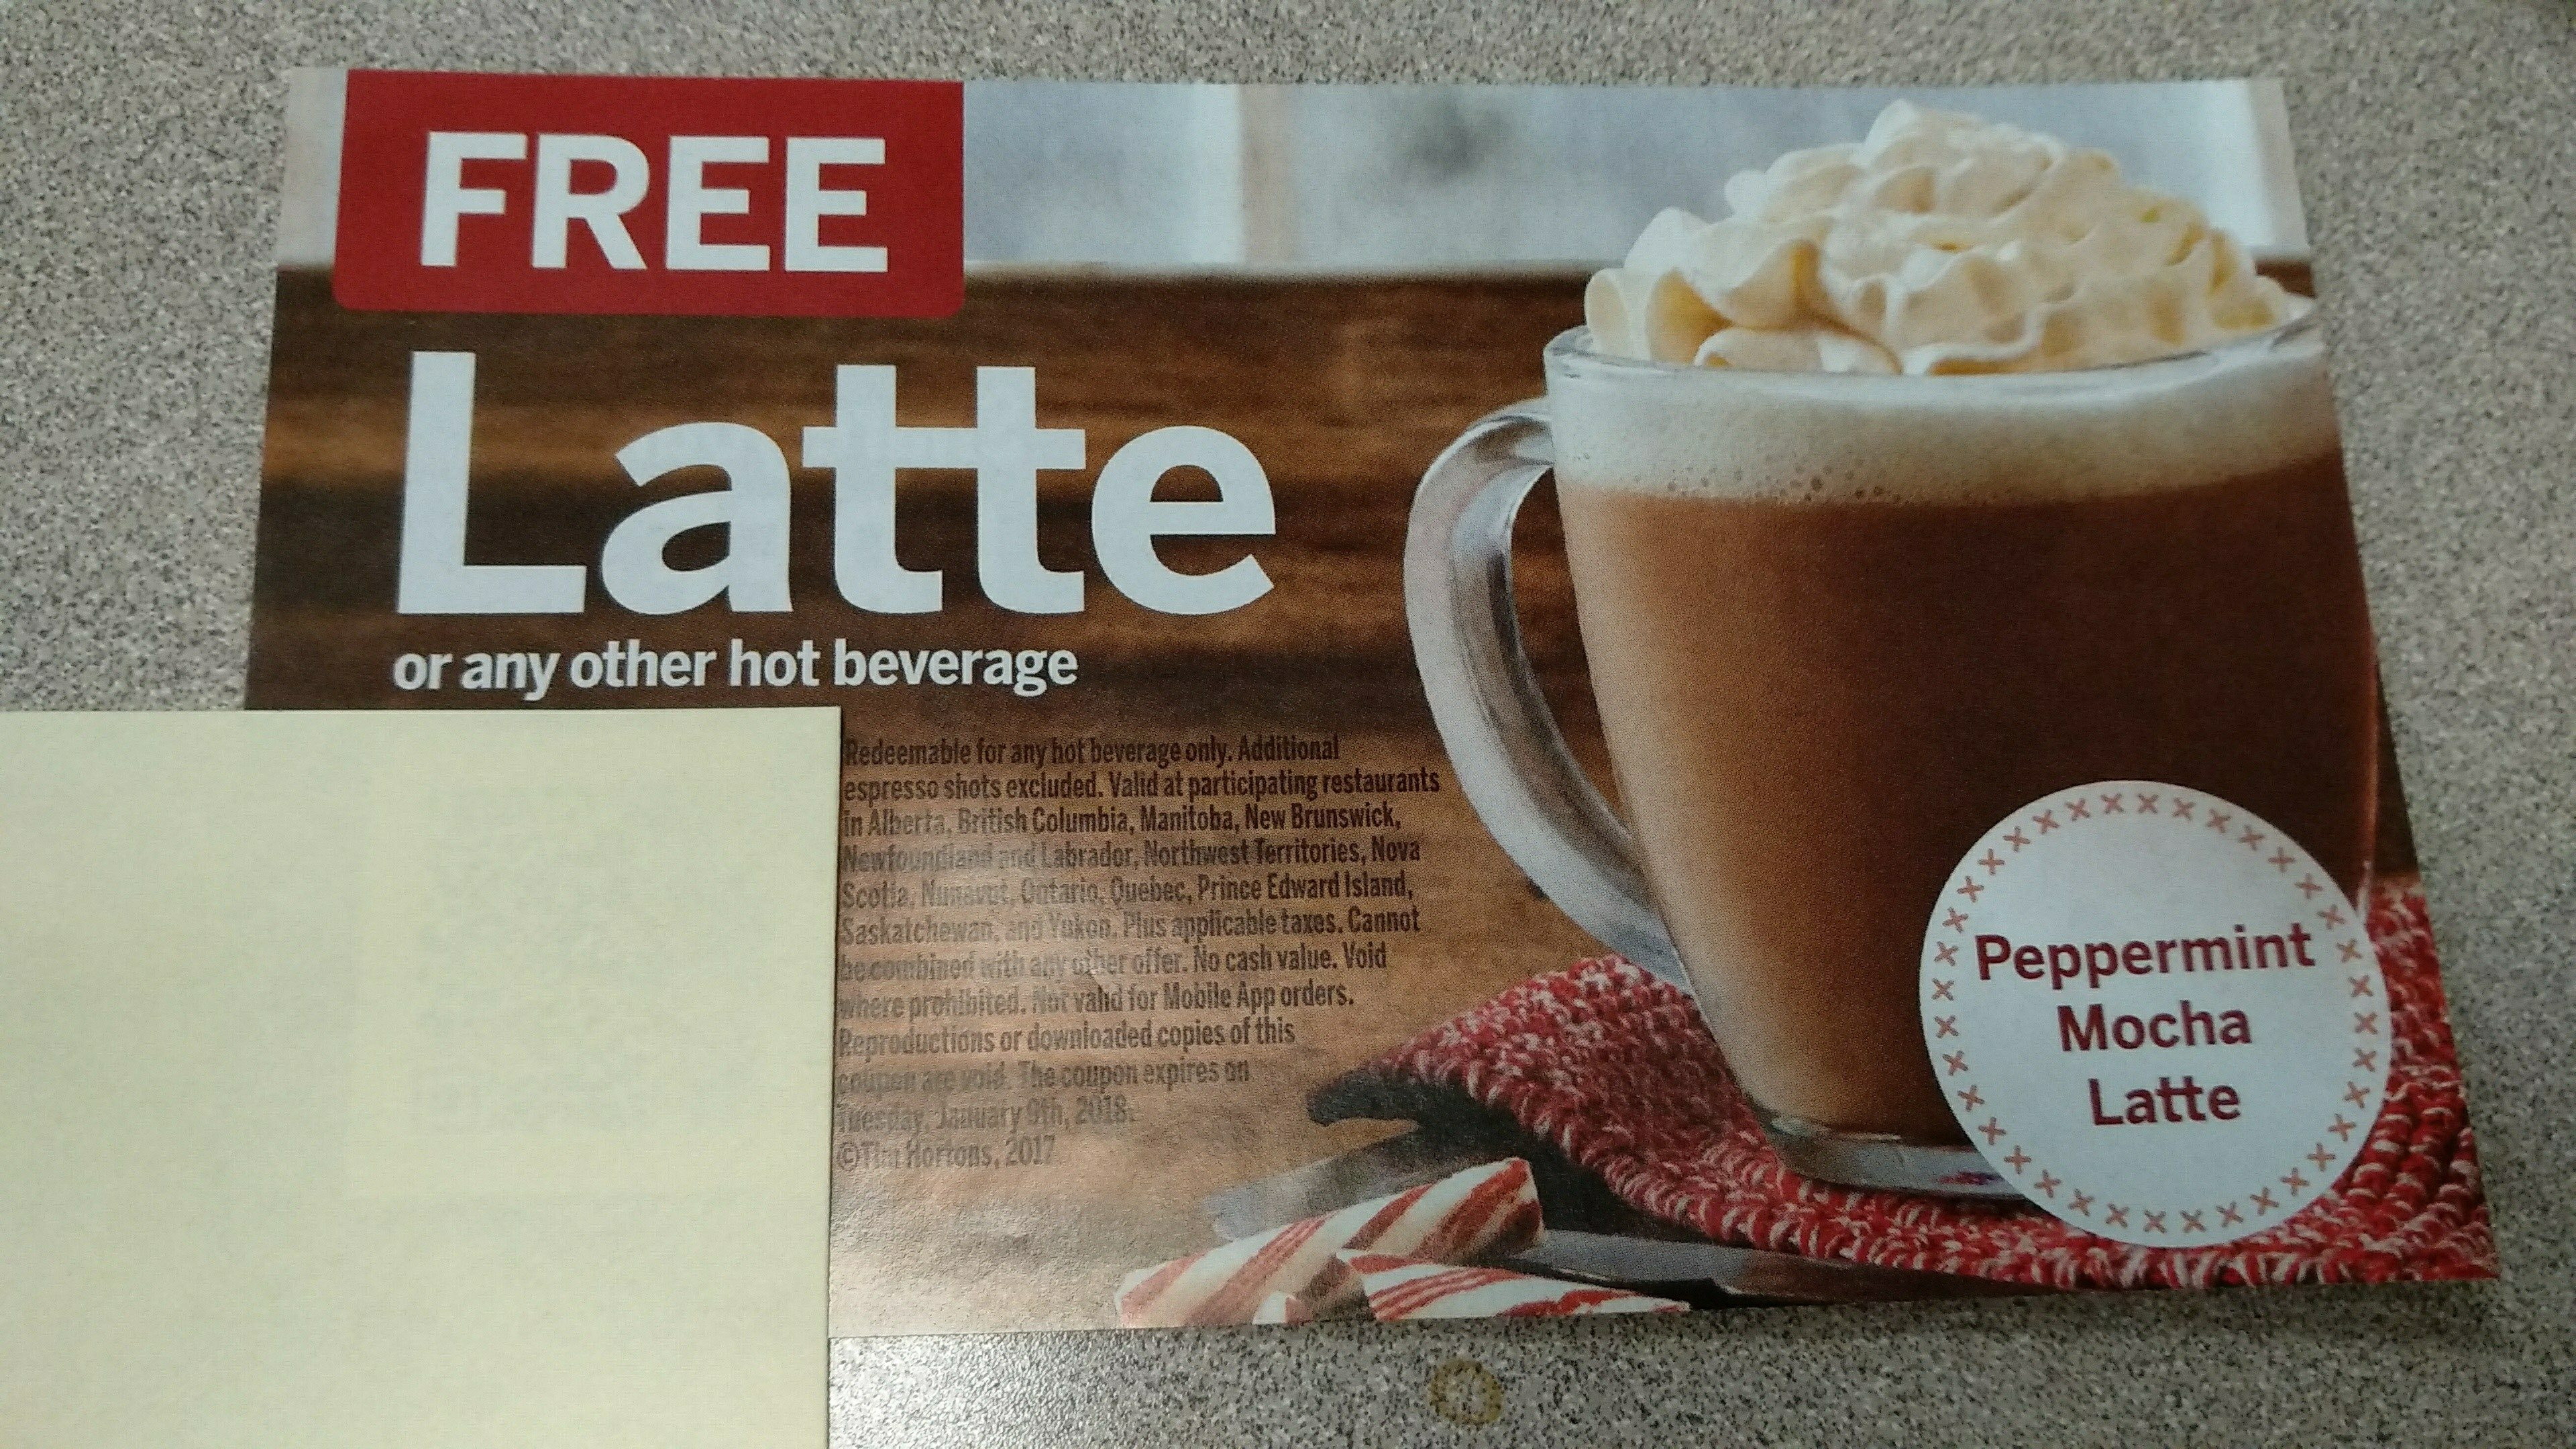 Tim Hortons] HOT! Tim Hortons free Latte or Hot Beverage